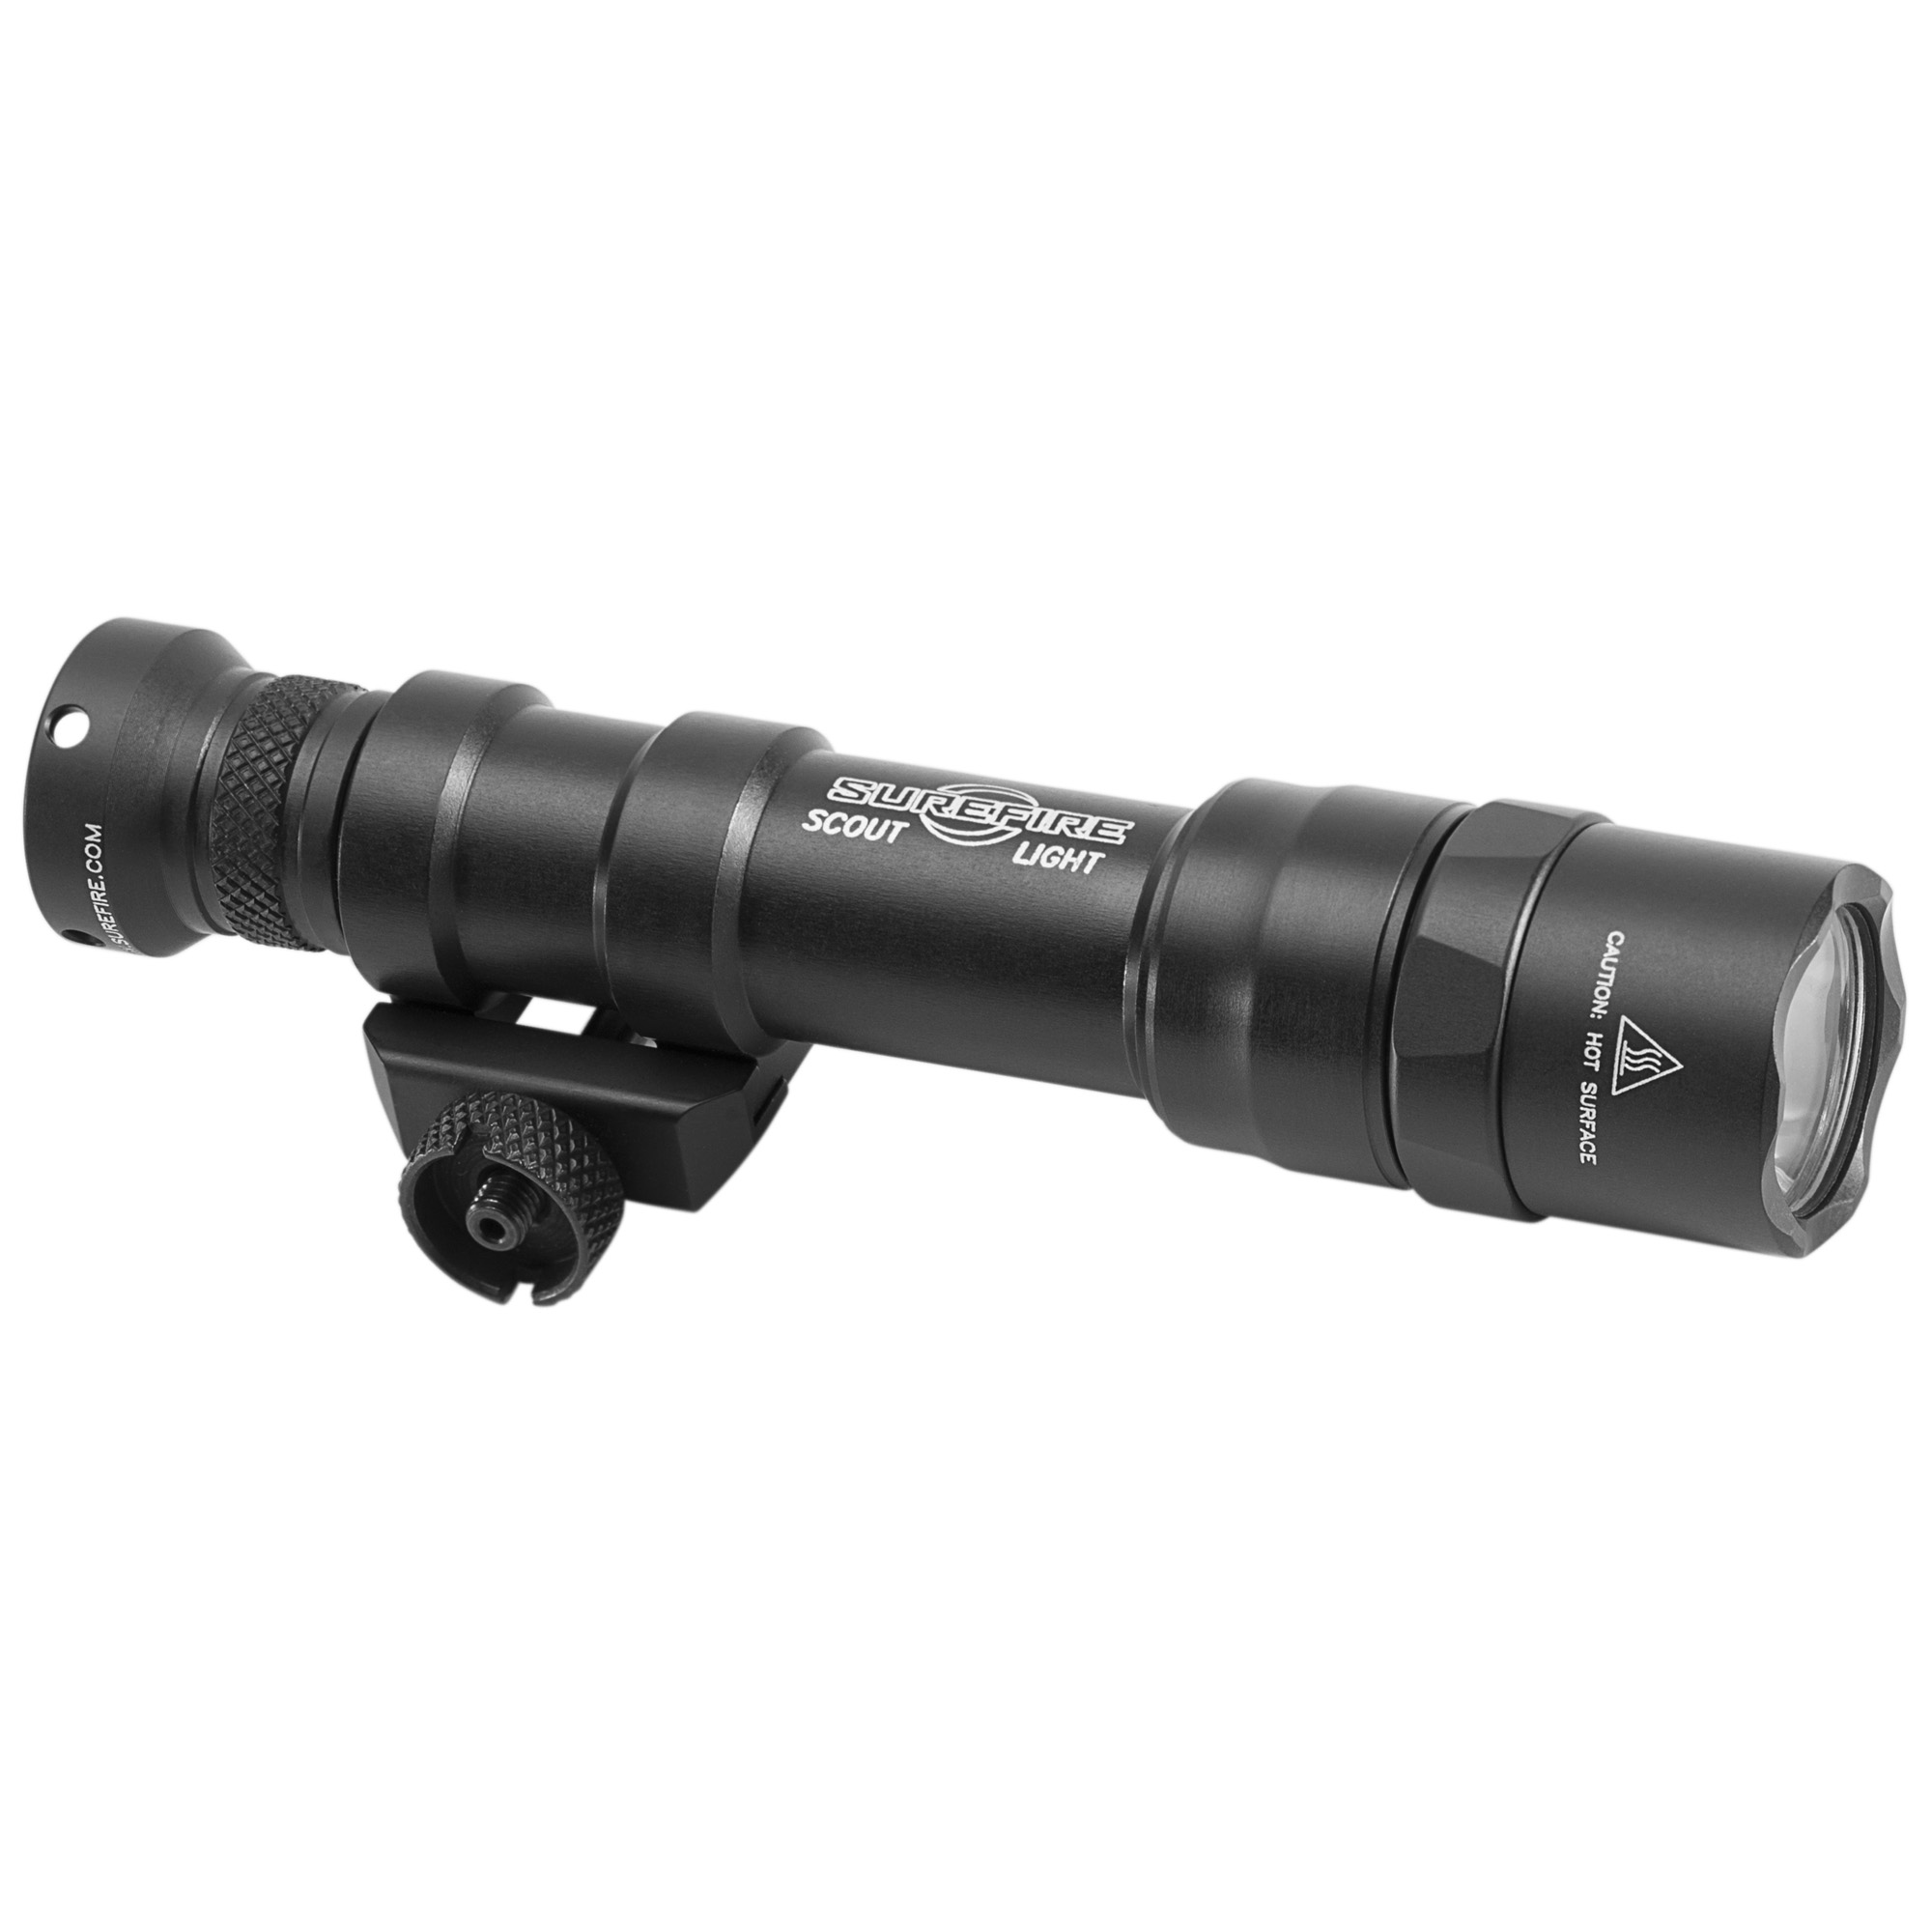 SFM600DF-BK_2_HR